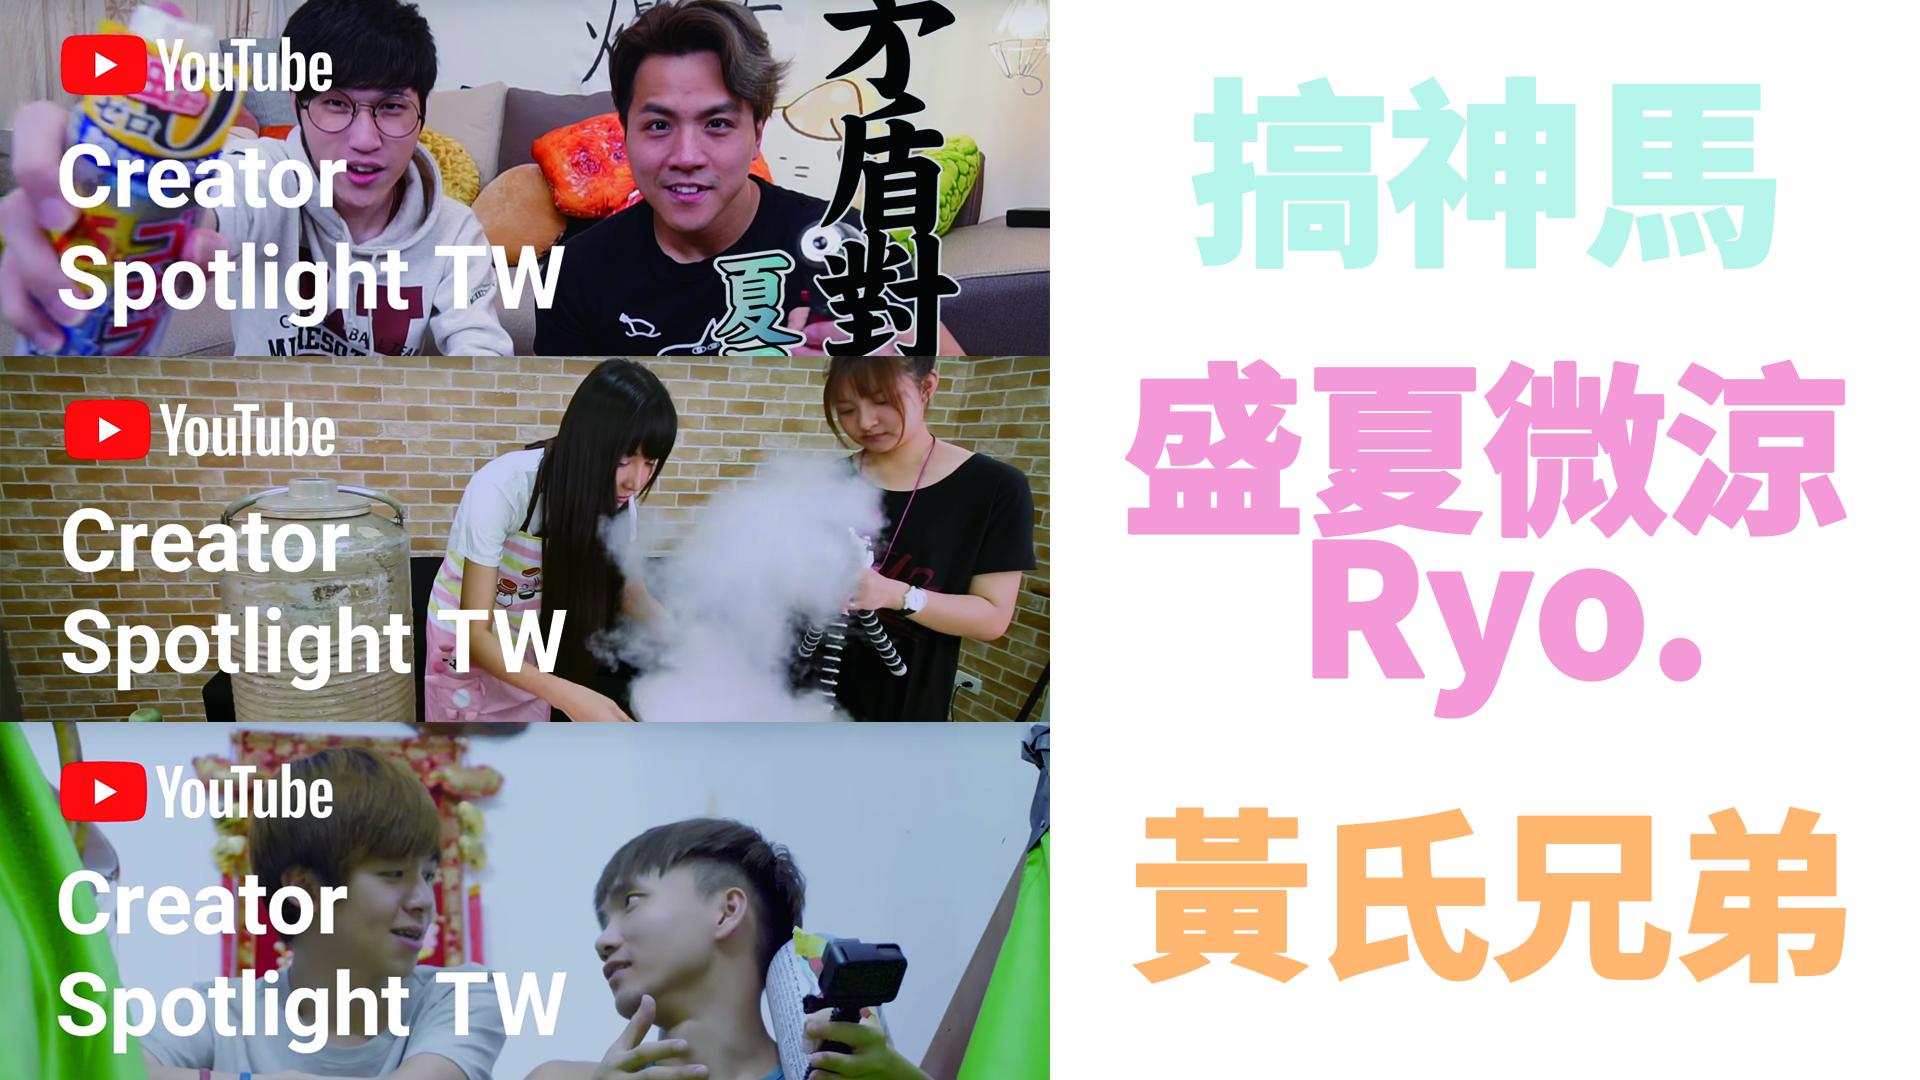 CAPSULE. Creator登上YouTube首頁 黃氏兄弟、搞神馬、盛夏微涼Ryo